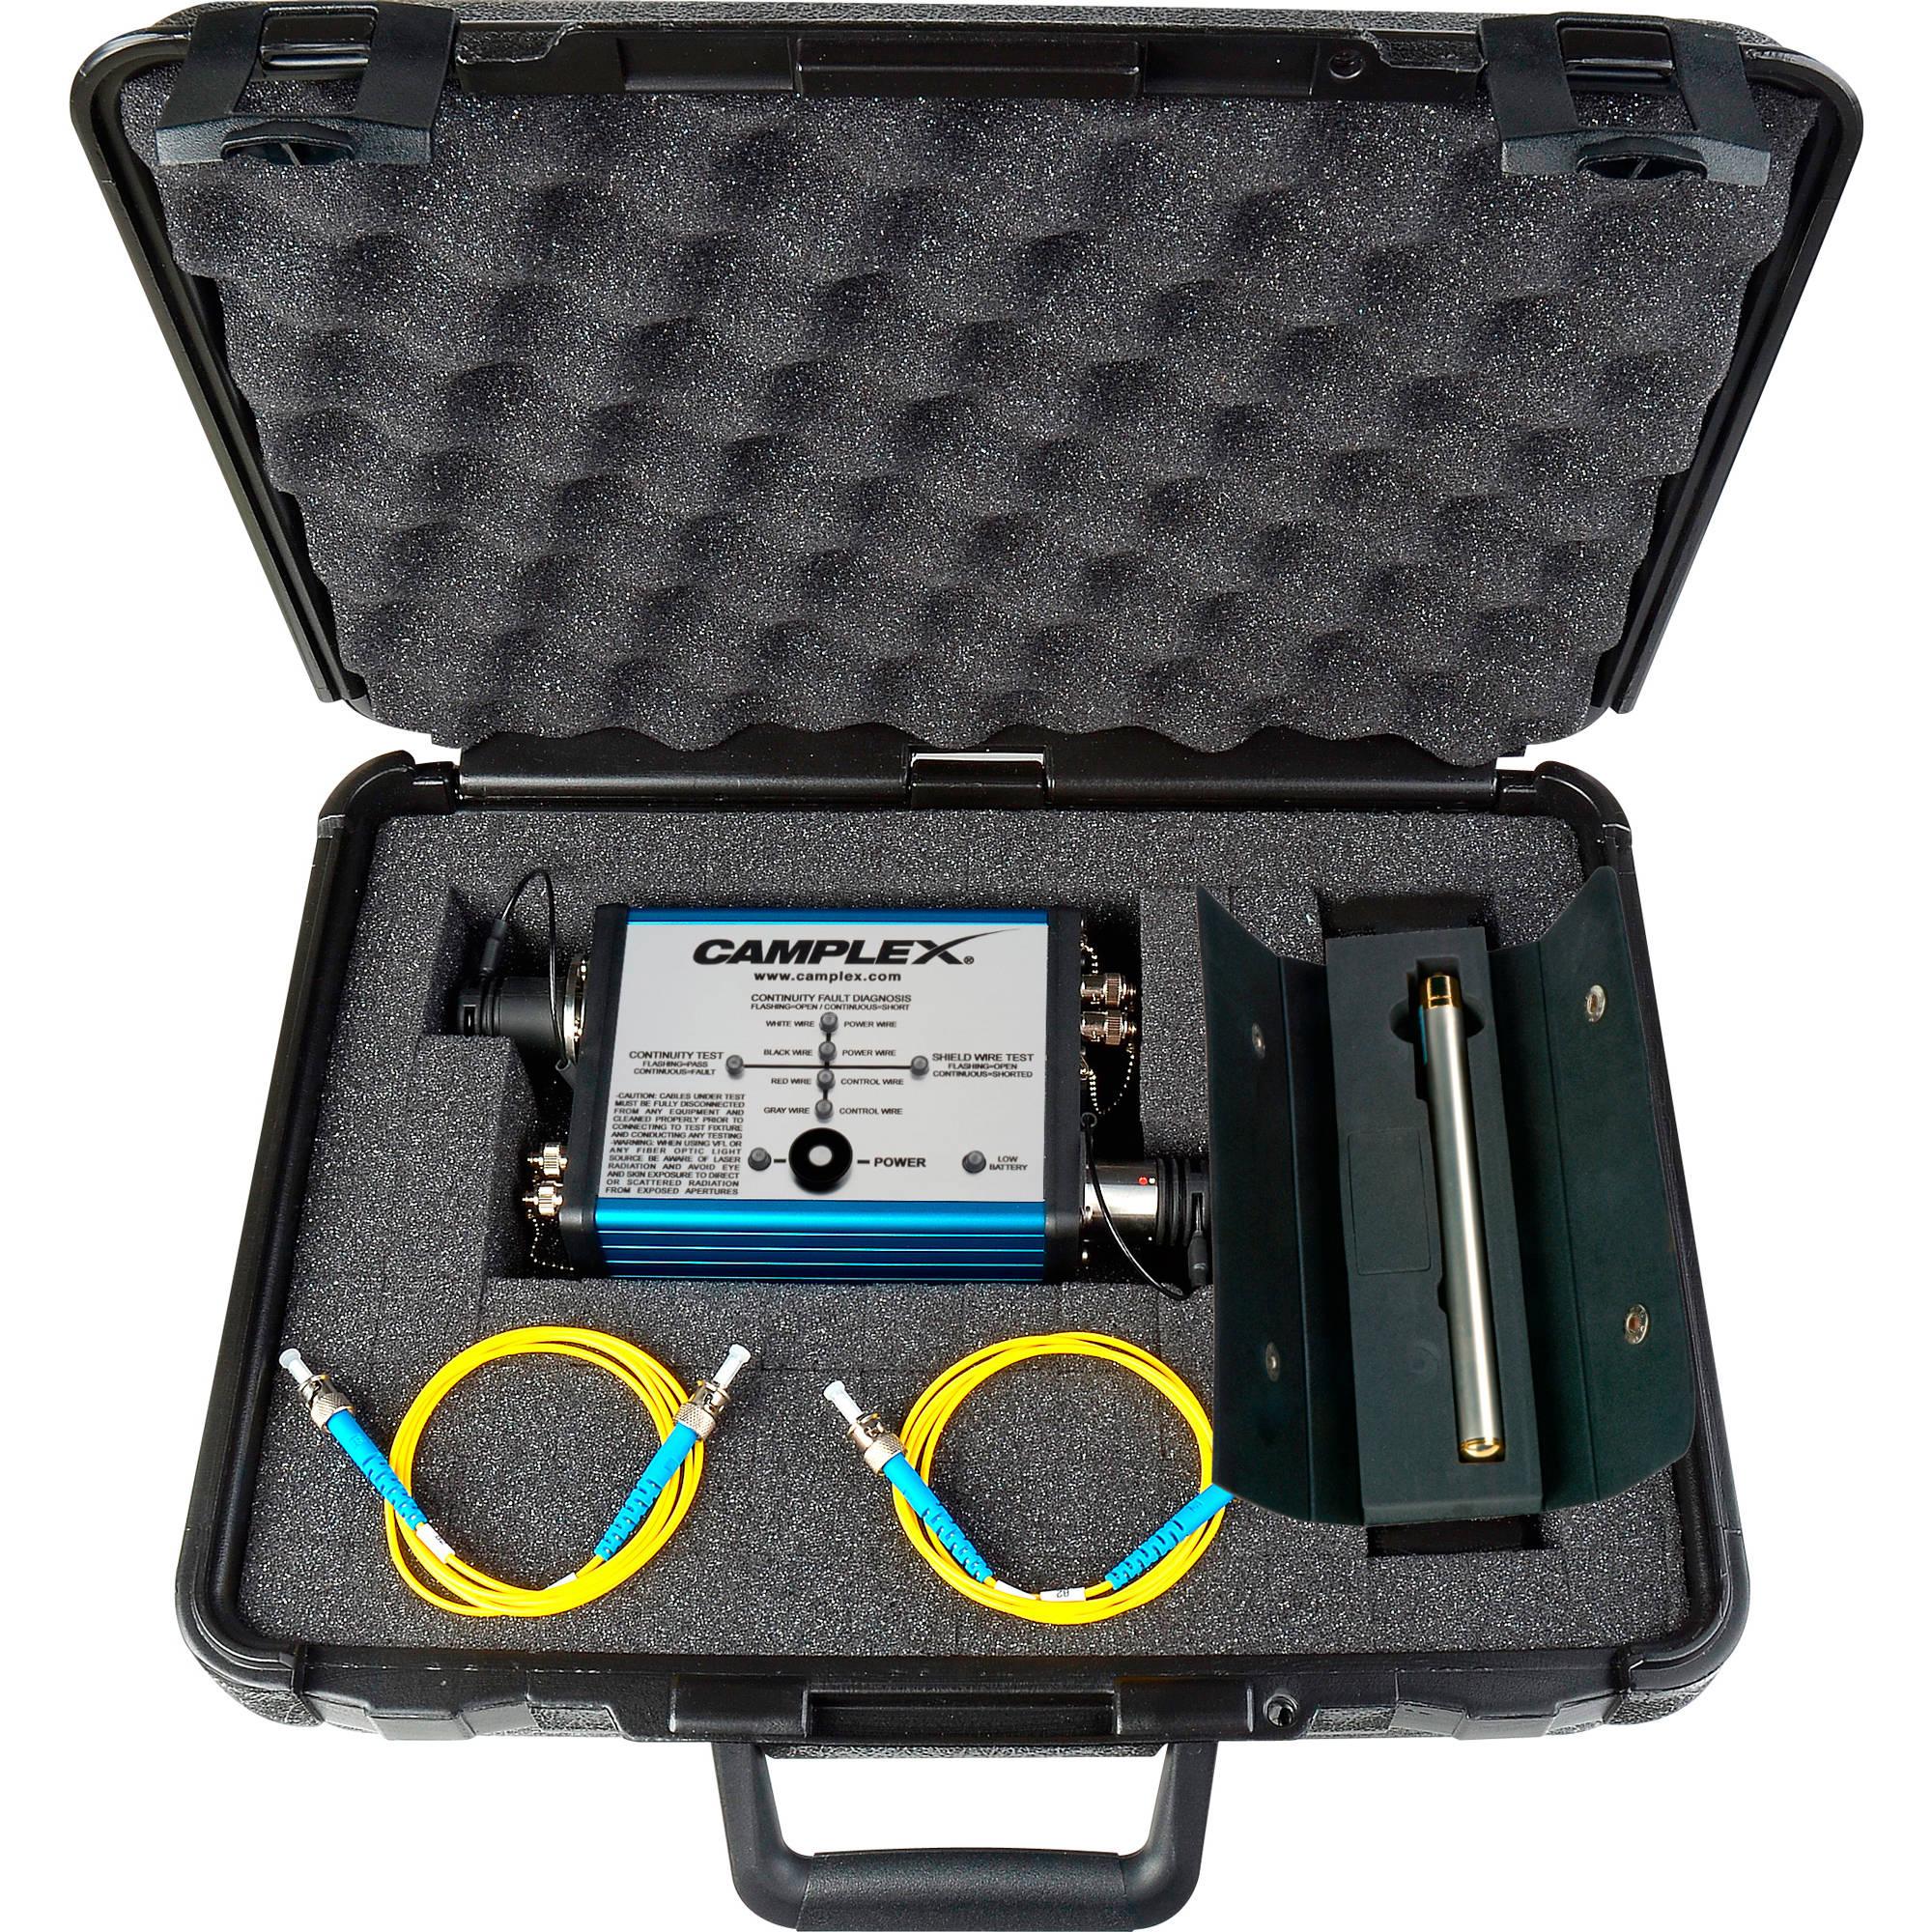 Fiber Cable Tester : Camplex smpte fiber optic cable tester cmx b h